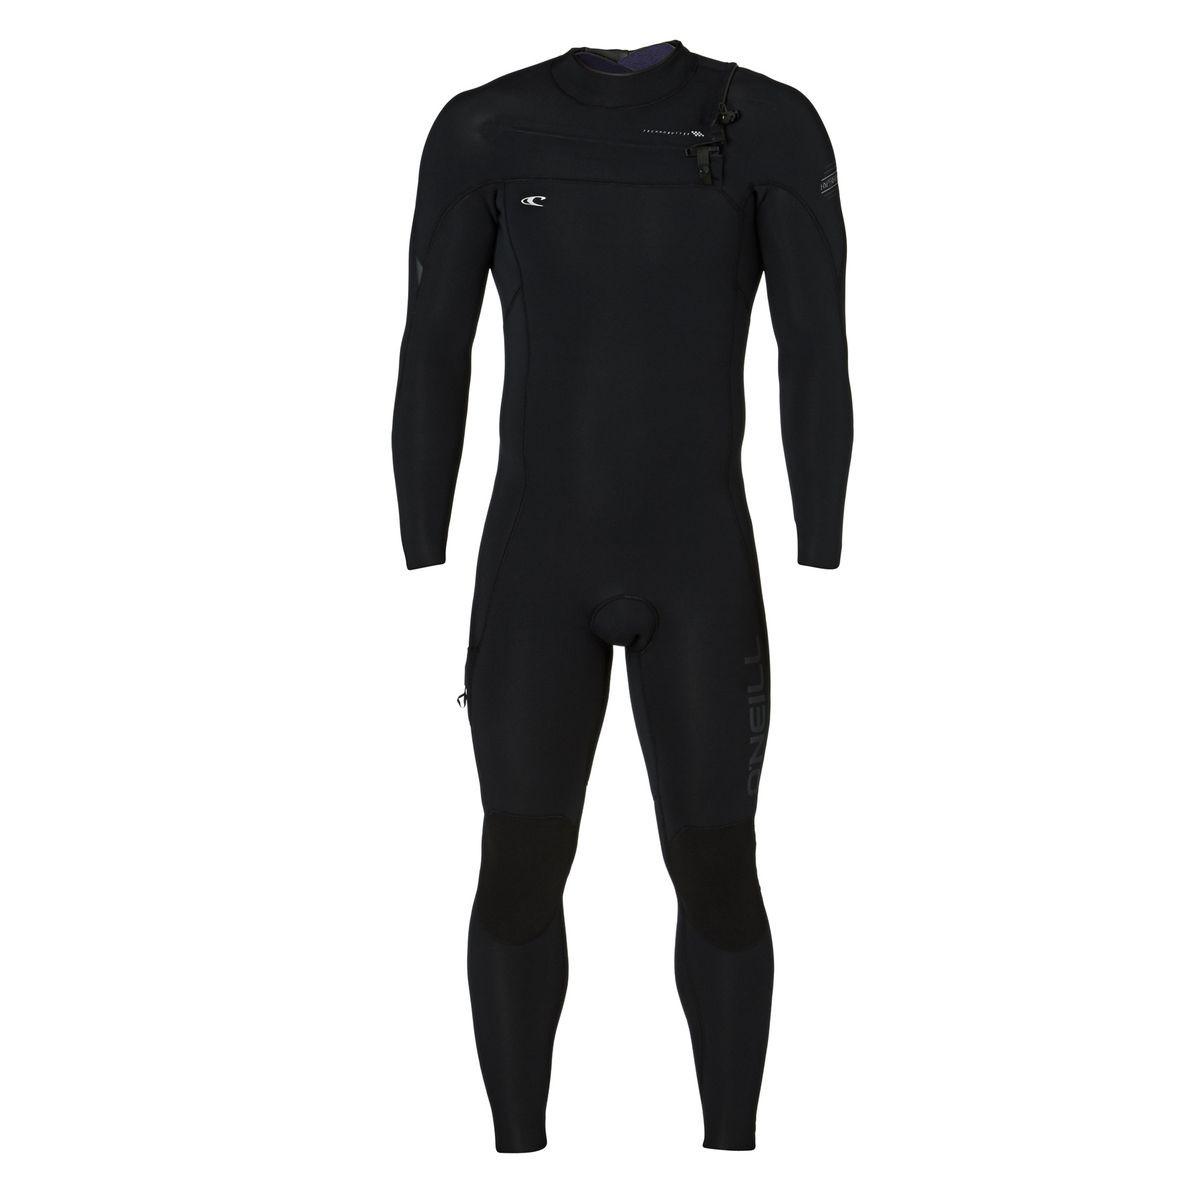 O'Neill Hyperfreak 5/4mm 2017 Chest Zip Wetsuit - Black/ Black/ Graphite